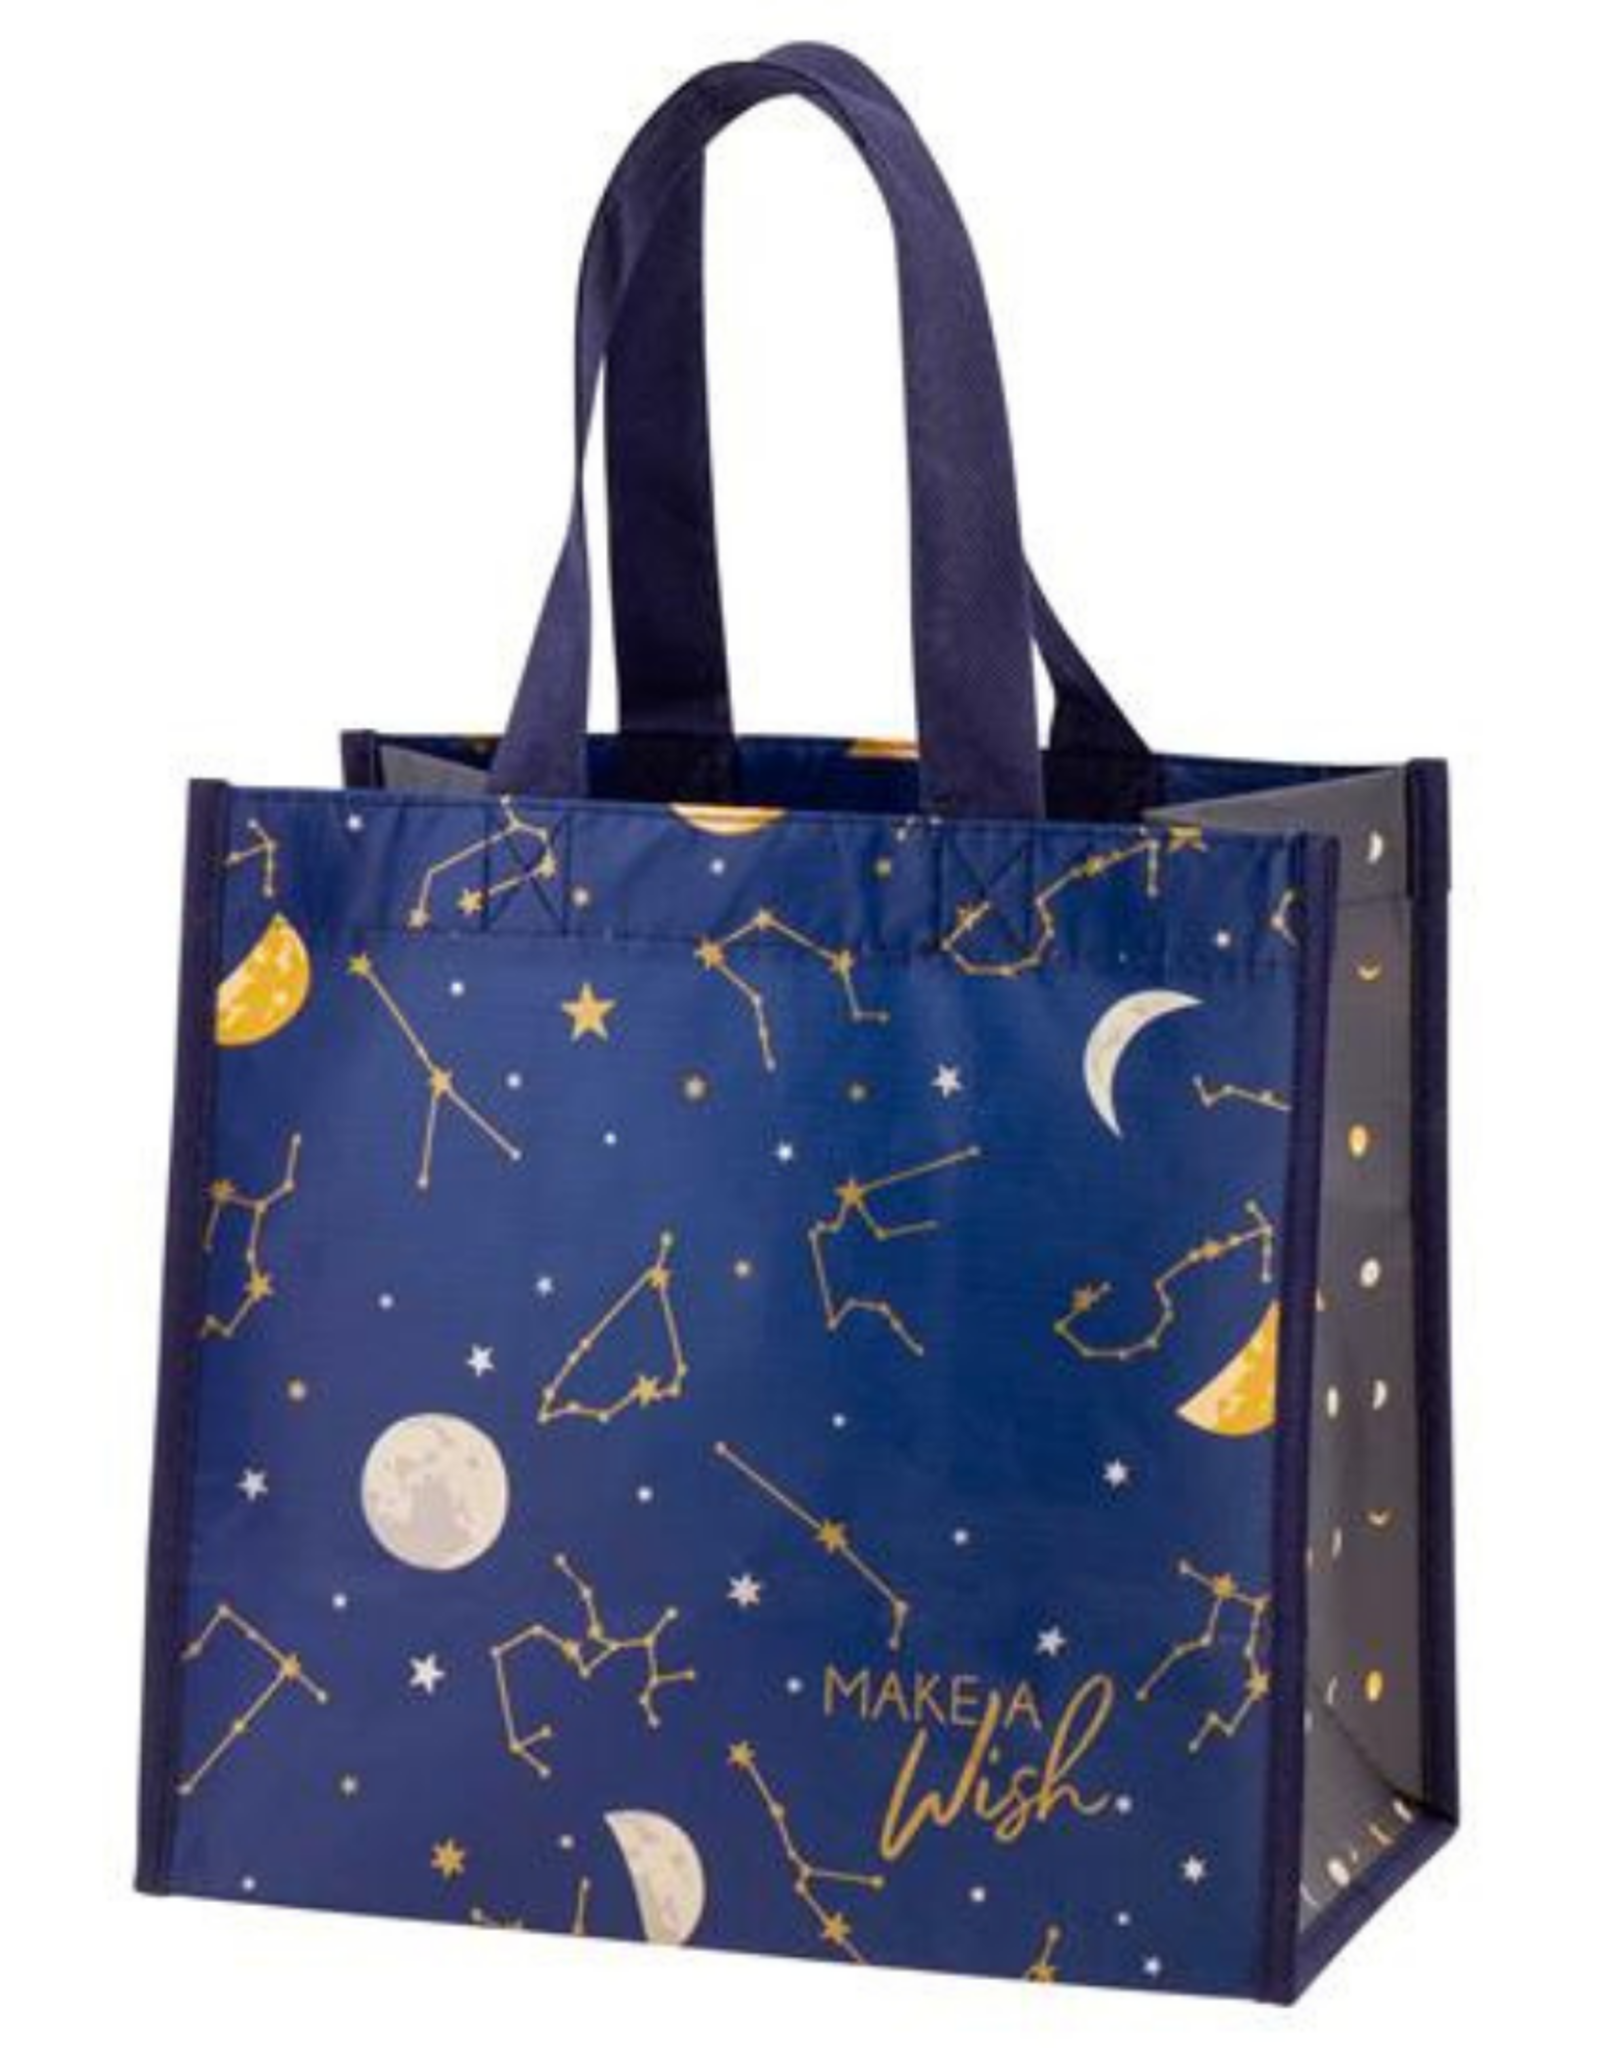 Make A Wish Celestial Gift Set